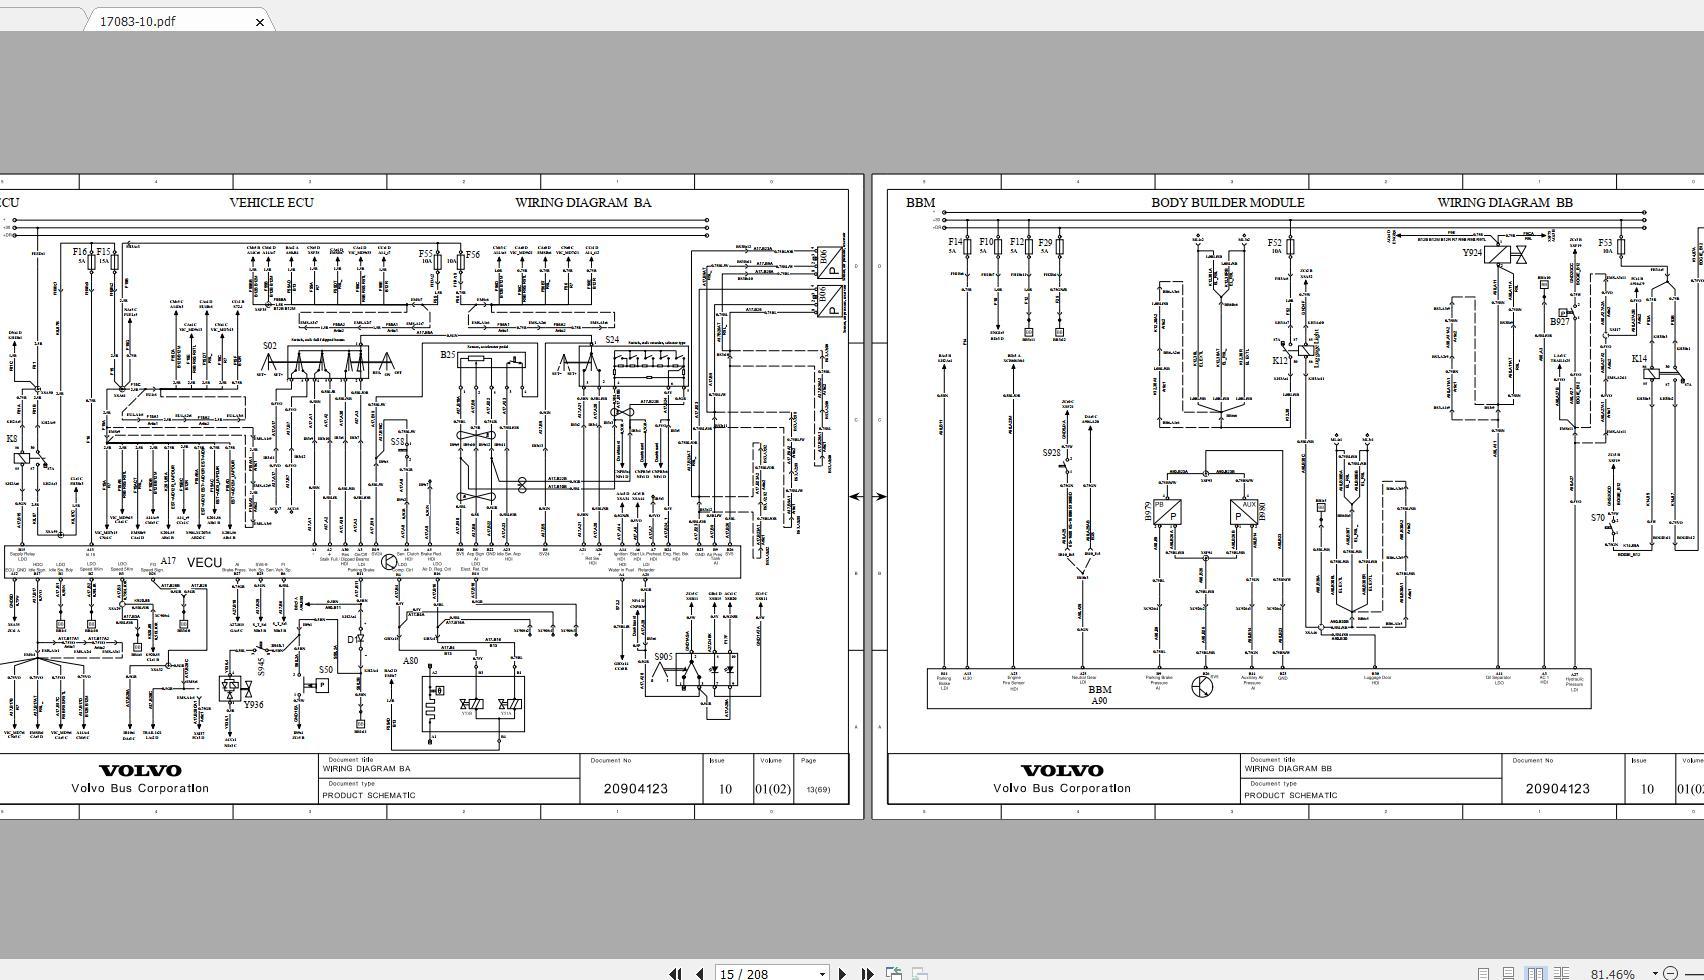 volvo b12b trucks service manual buses & wiring diagrams - auto repair  software-auto epc software-auto repair manual-workshop manual-service  manual-workshop manual  auto repair software-auto epc software-auto repair manual